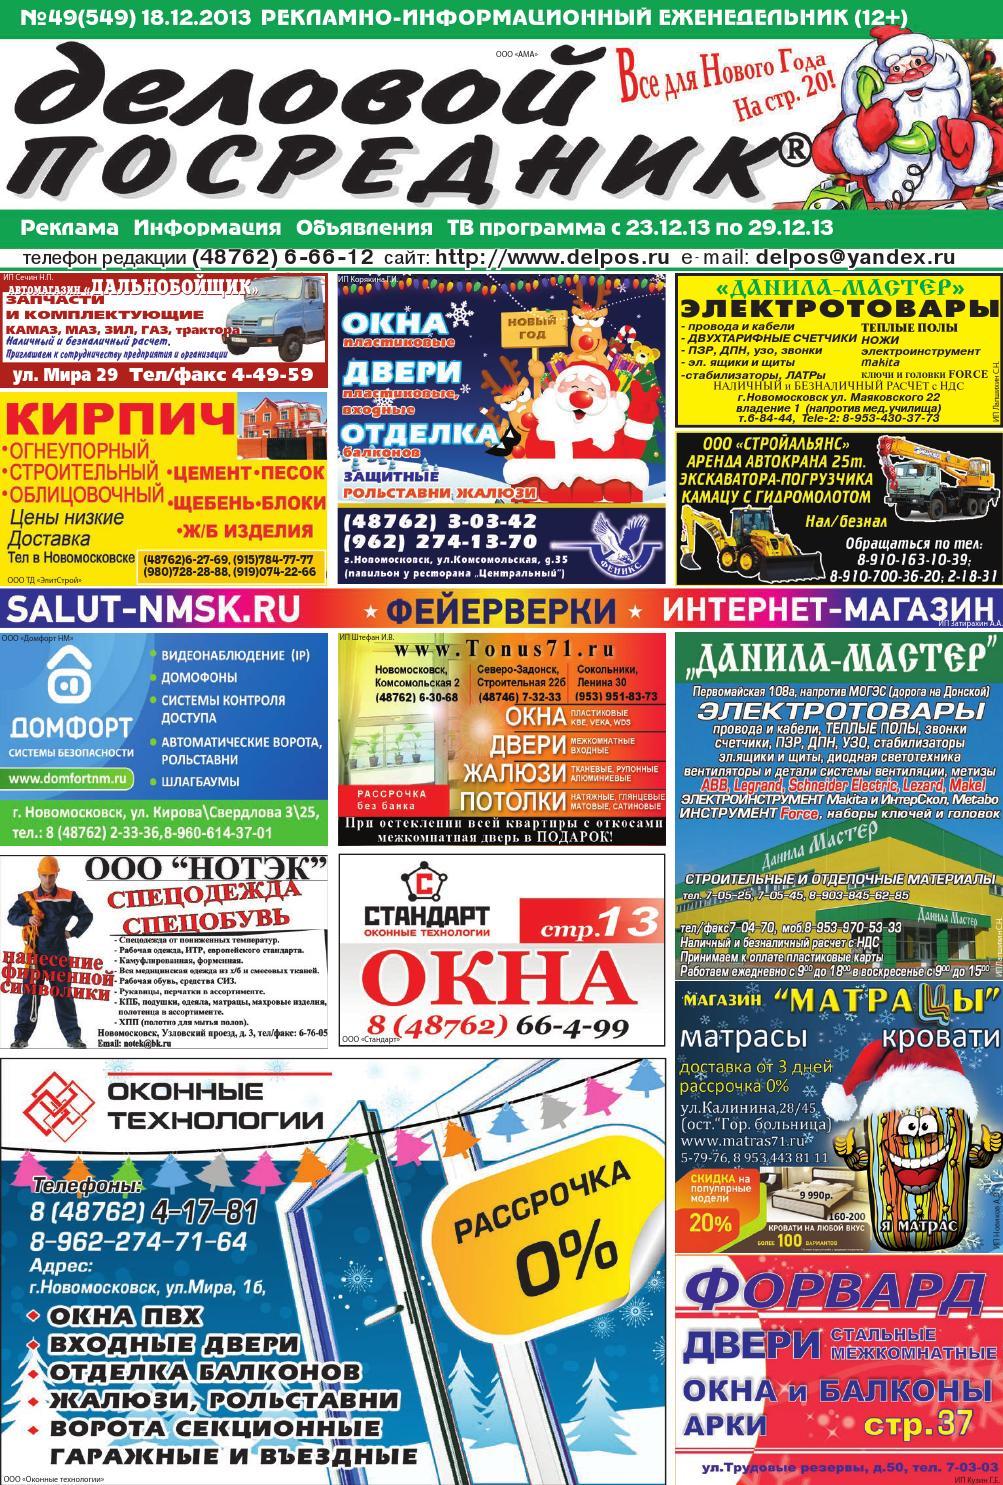 инструкция по тб электрогазосварщика казахстан